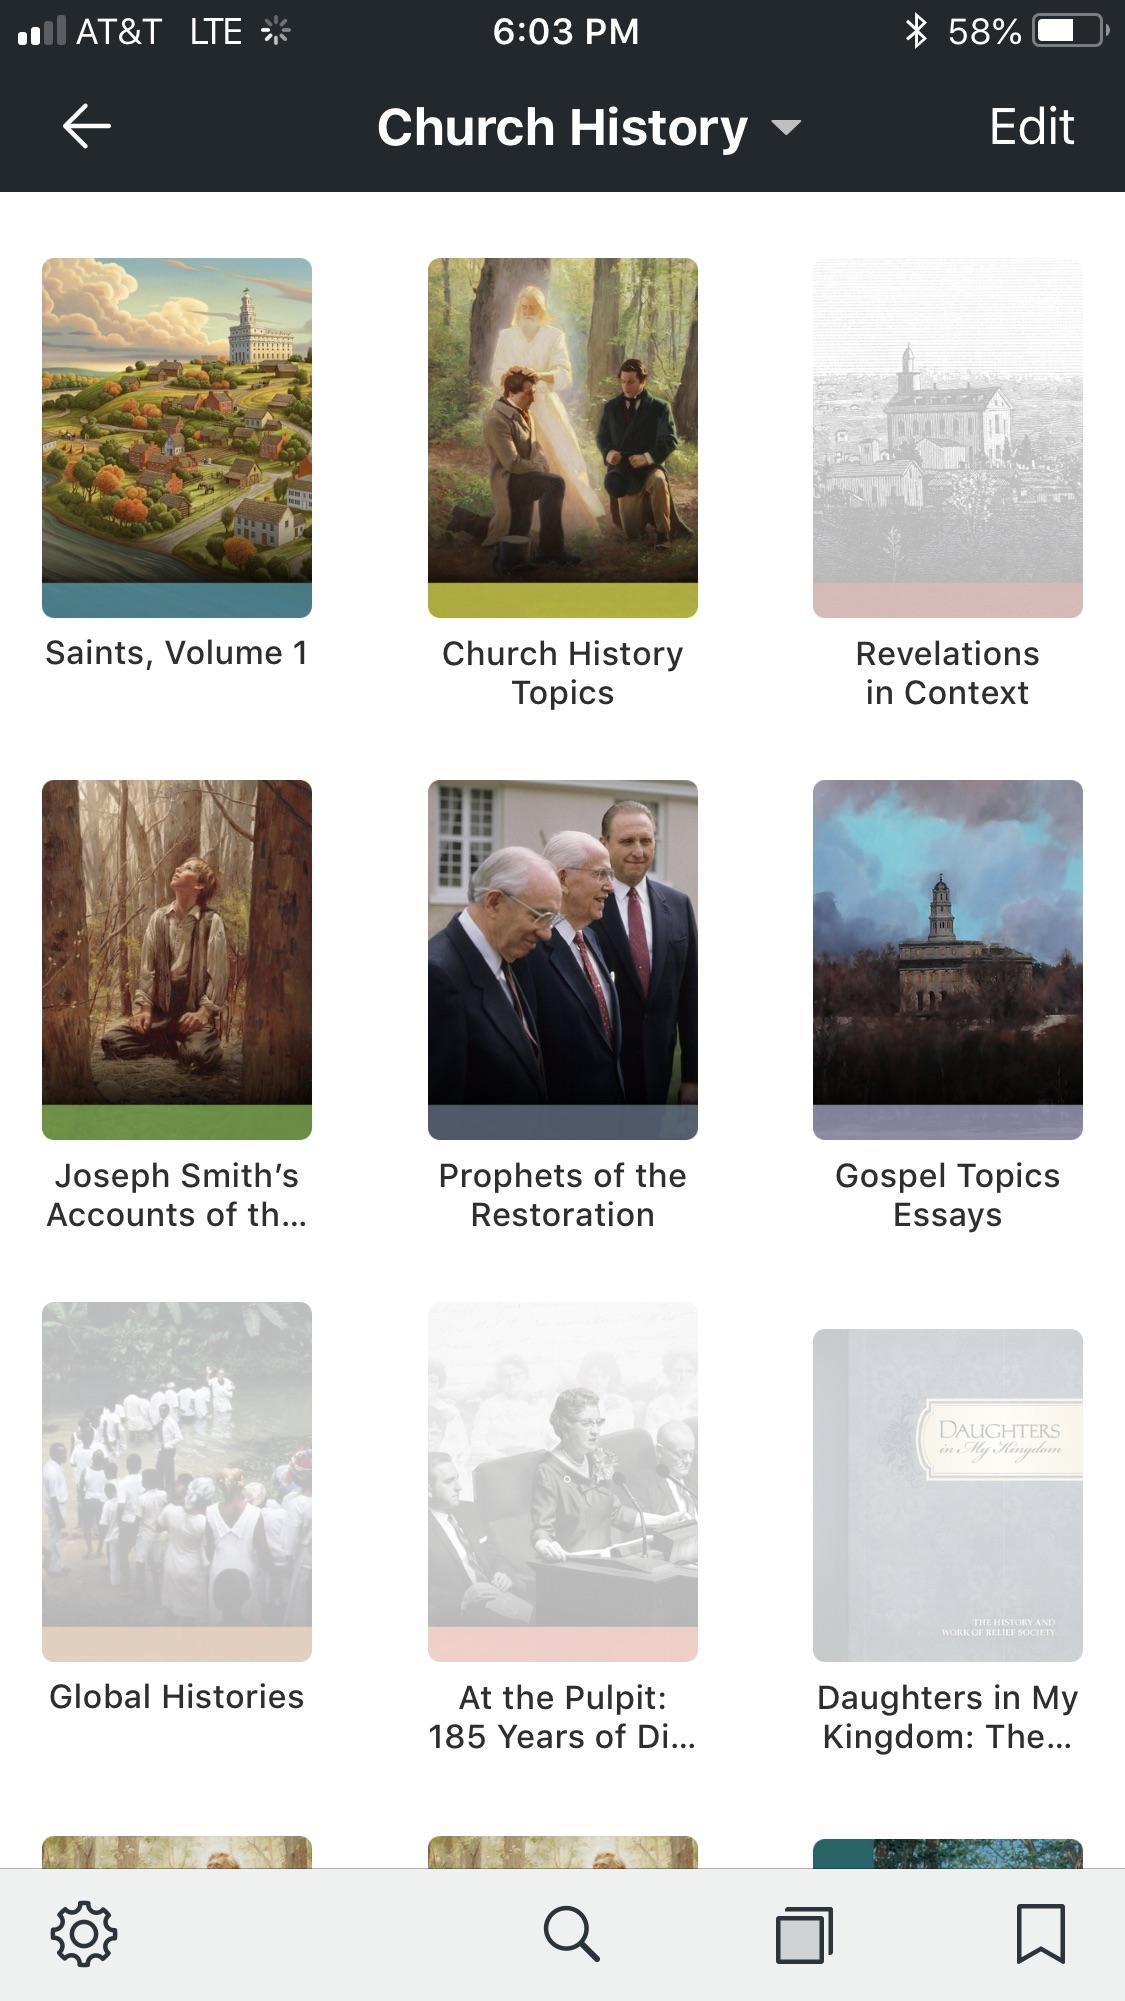 004 Y3rimfgj5jh11 Gospel Topics Essays Essay Outstanding Book Of Abraham Pdf Mormon Translation Full